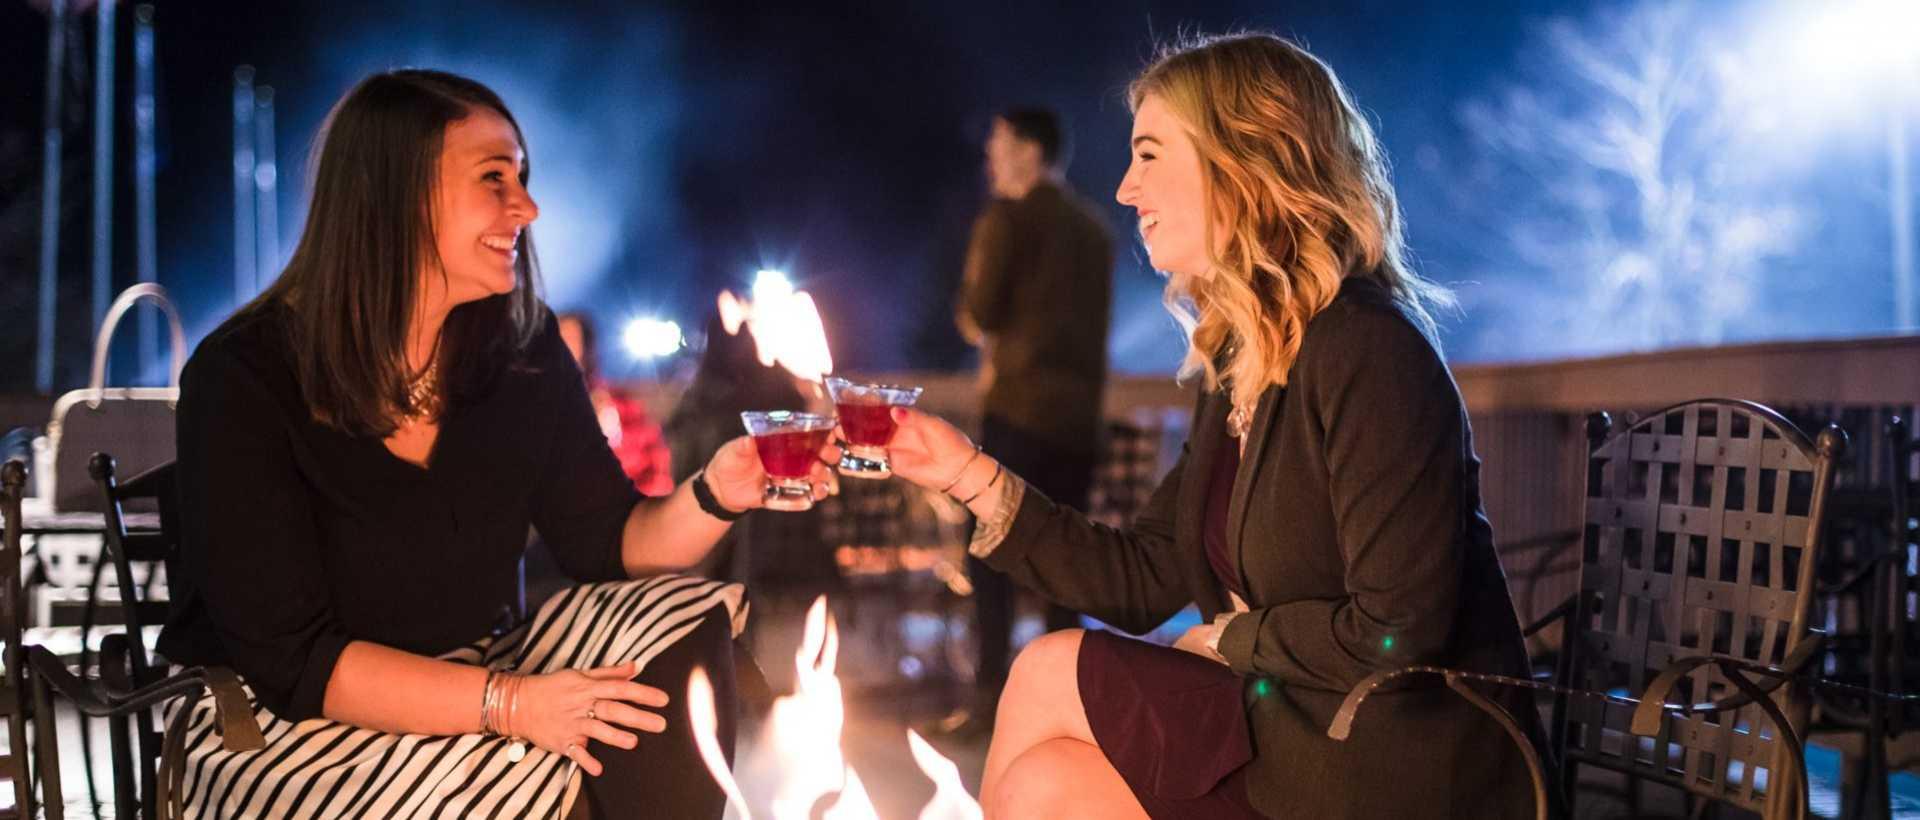 Two women enjoying drinks outdoors near a fire pit at Montage Mountain in Scranton, Lackawanna County, PA.